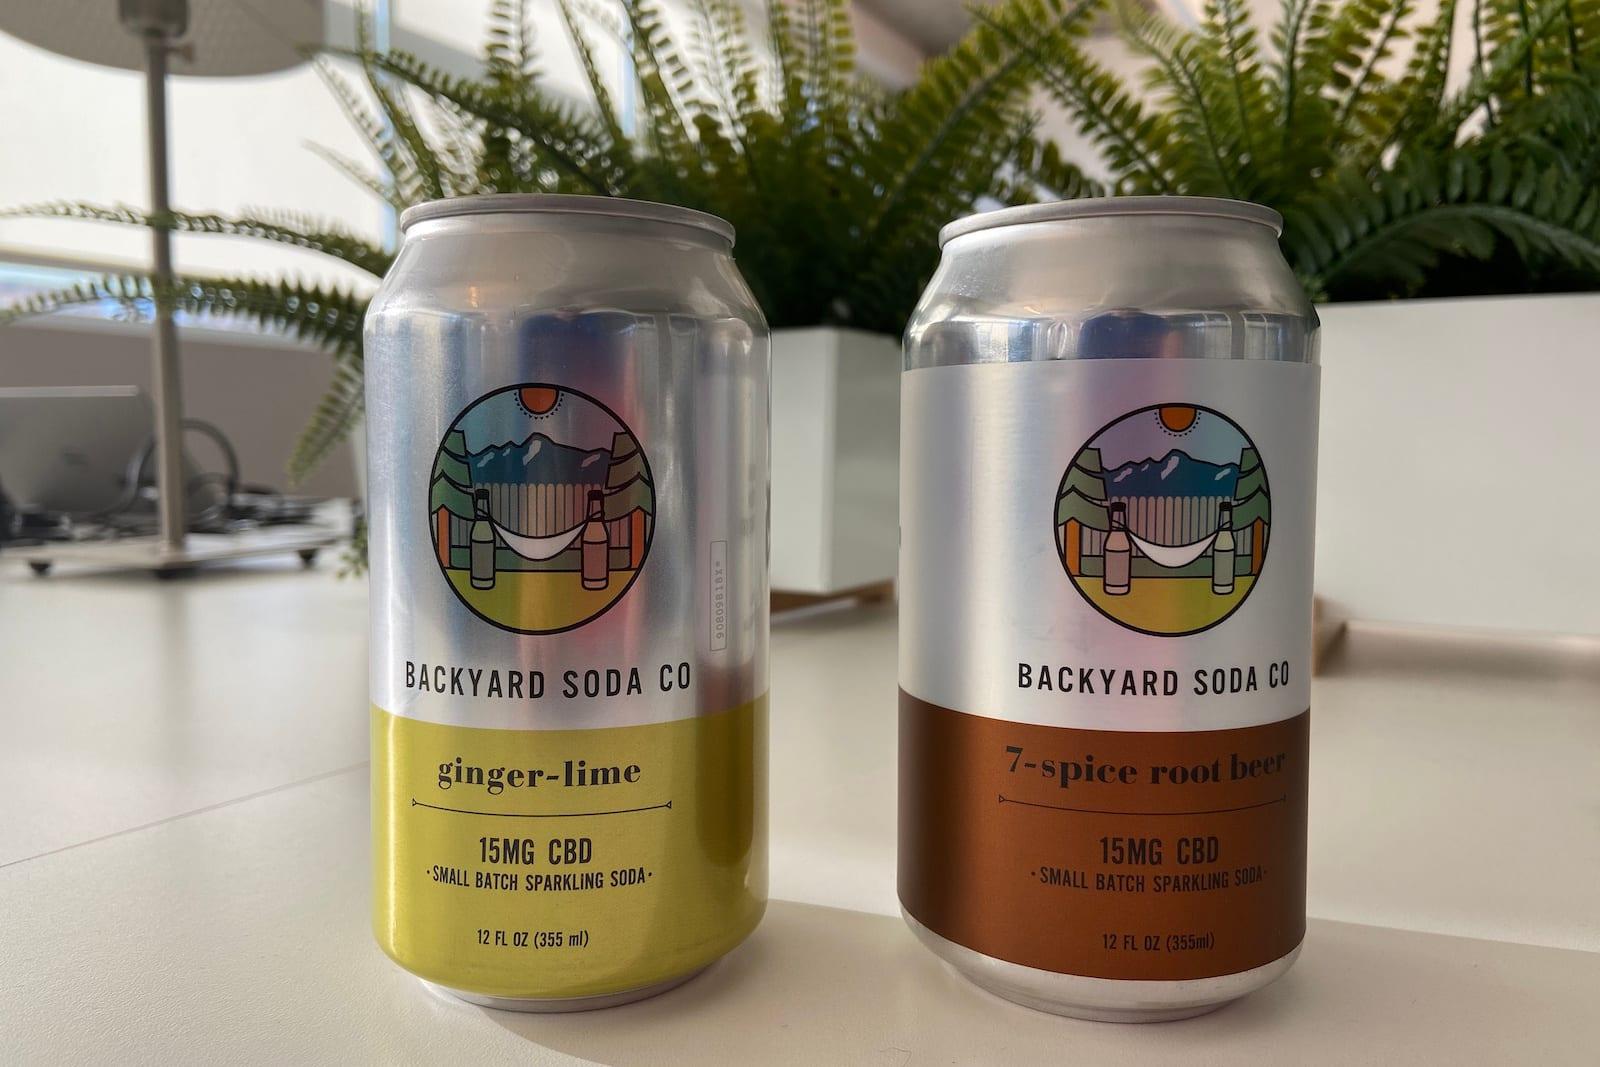 Backyard Soda Company CBD Cans